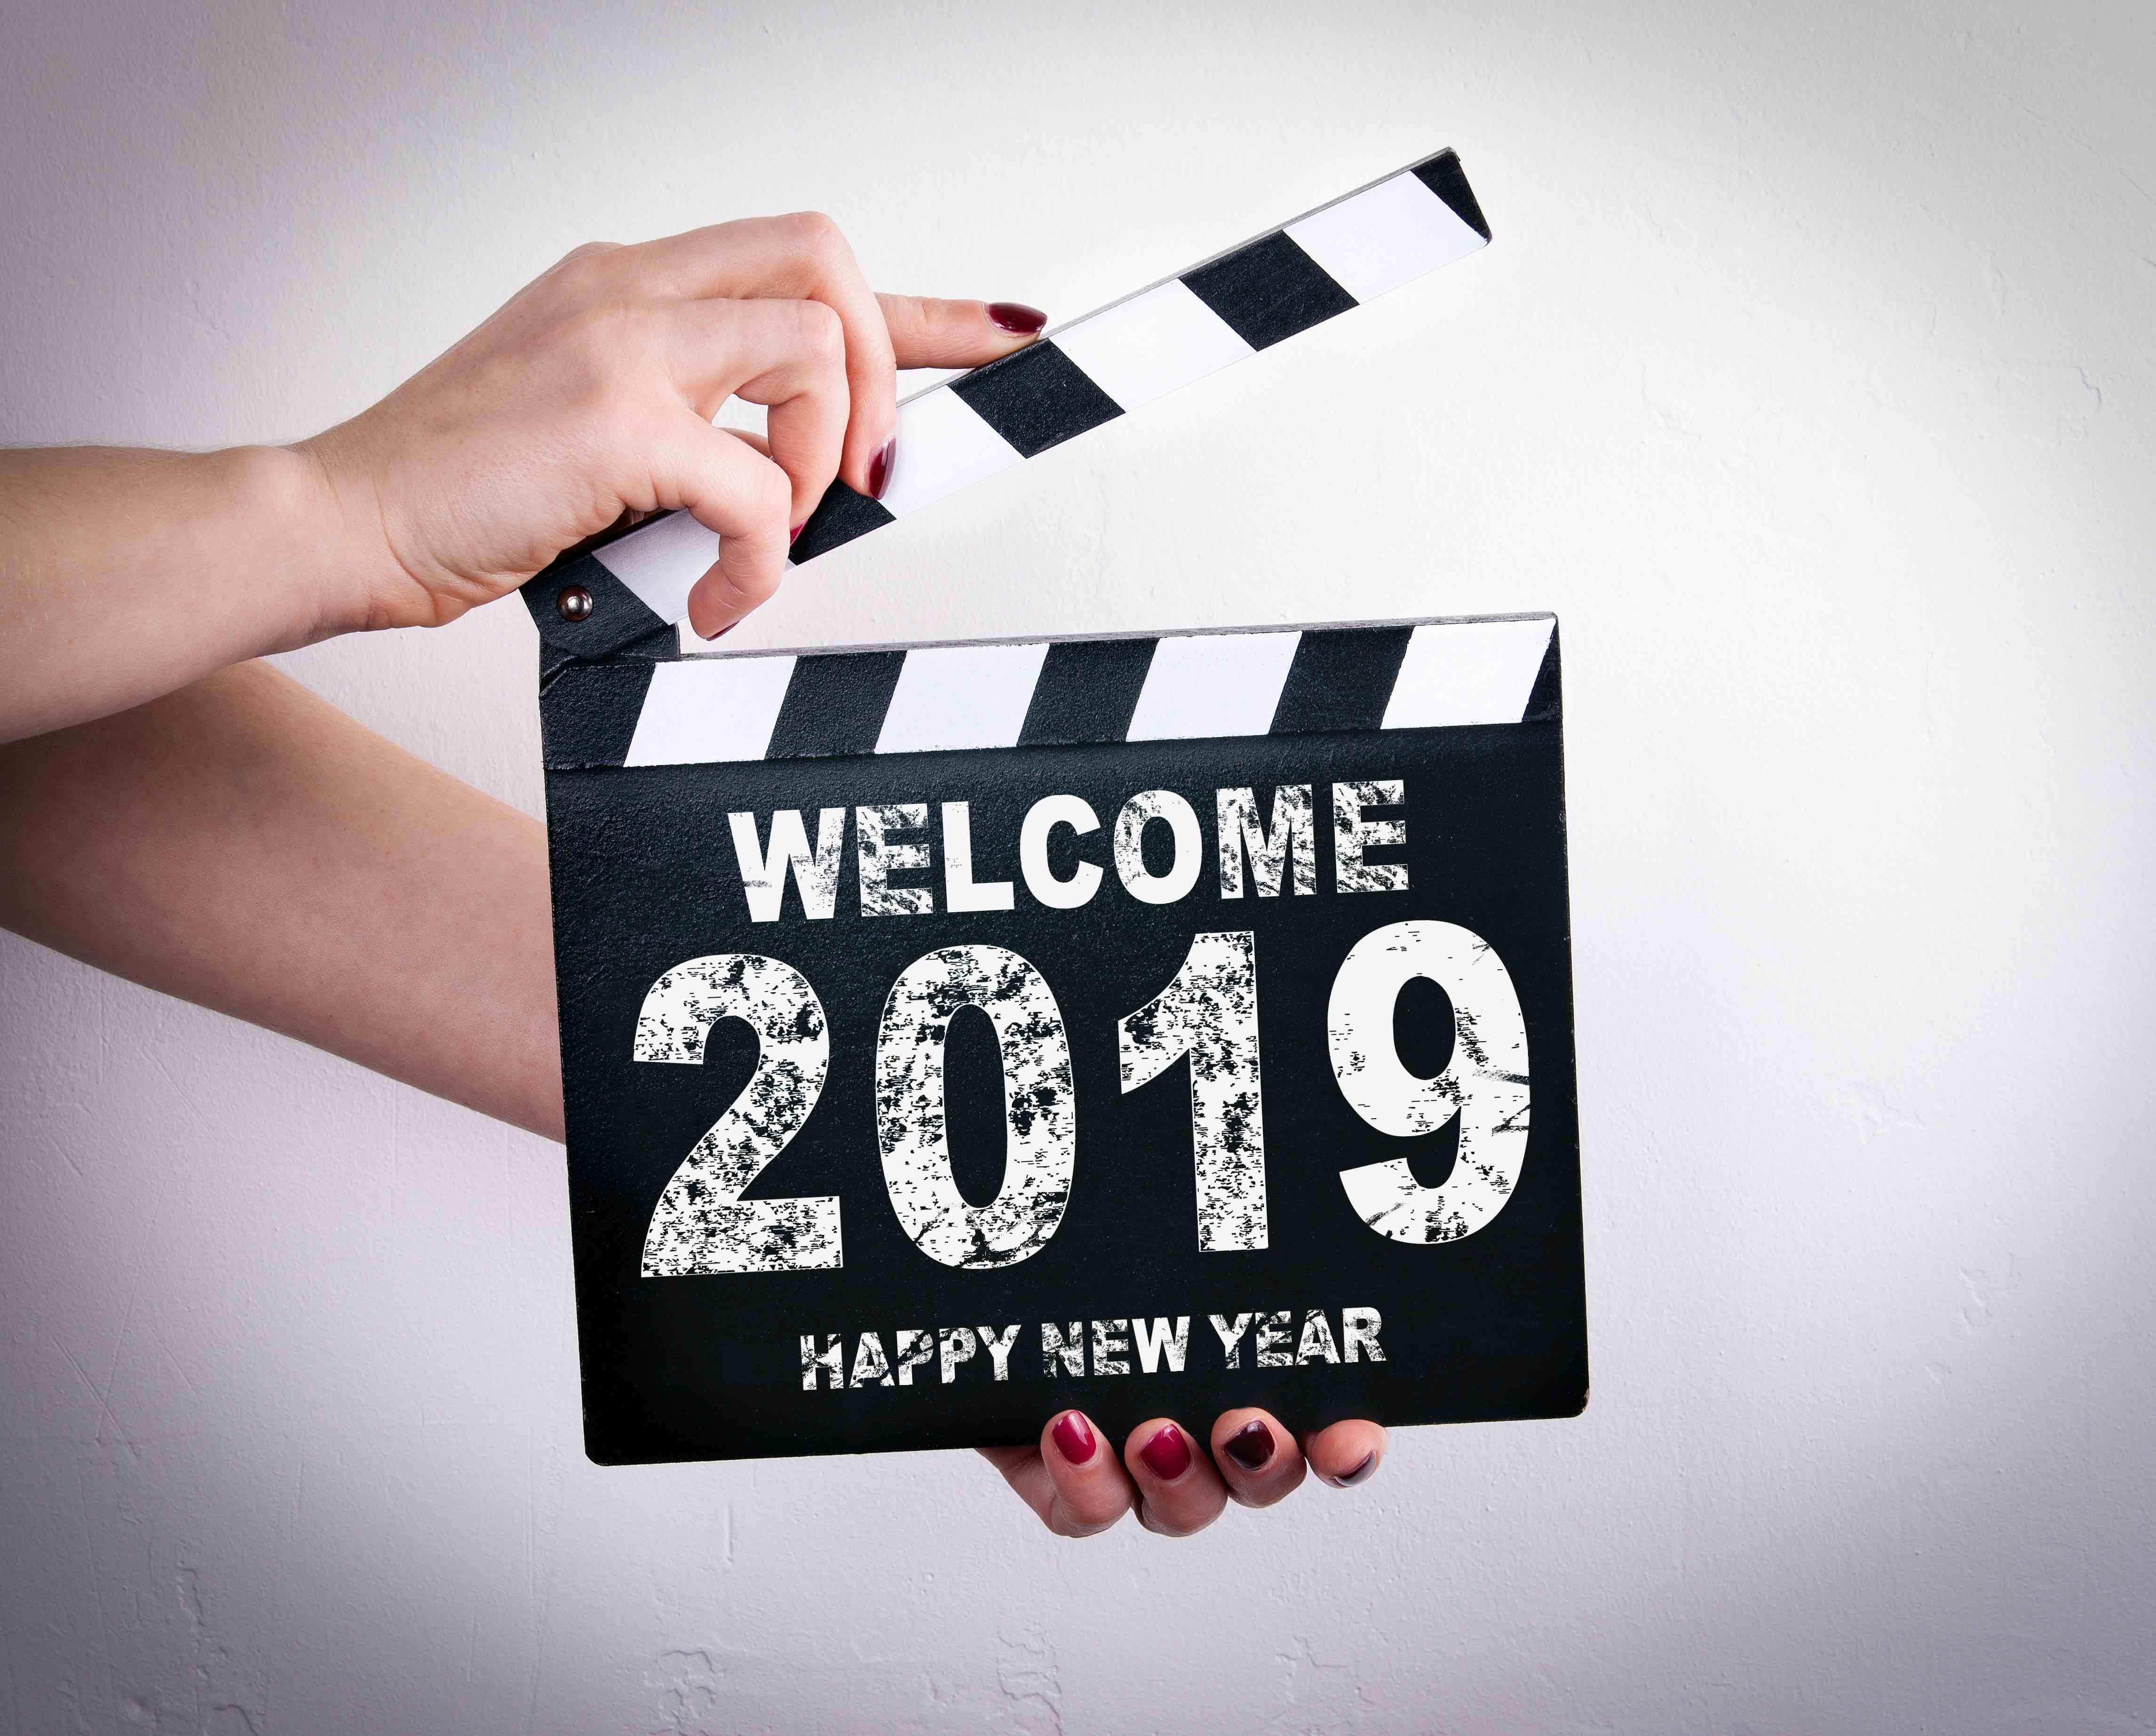 Calendario de estrenos: cine en 2019